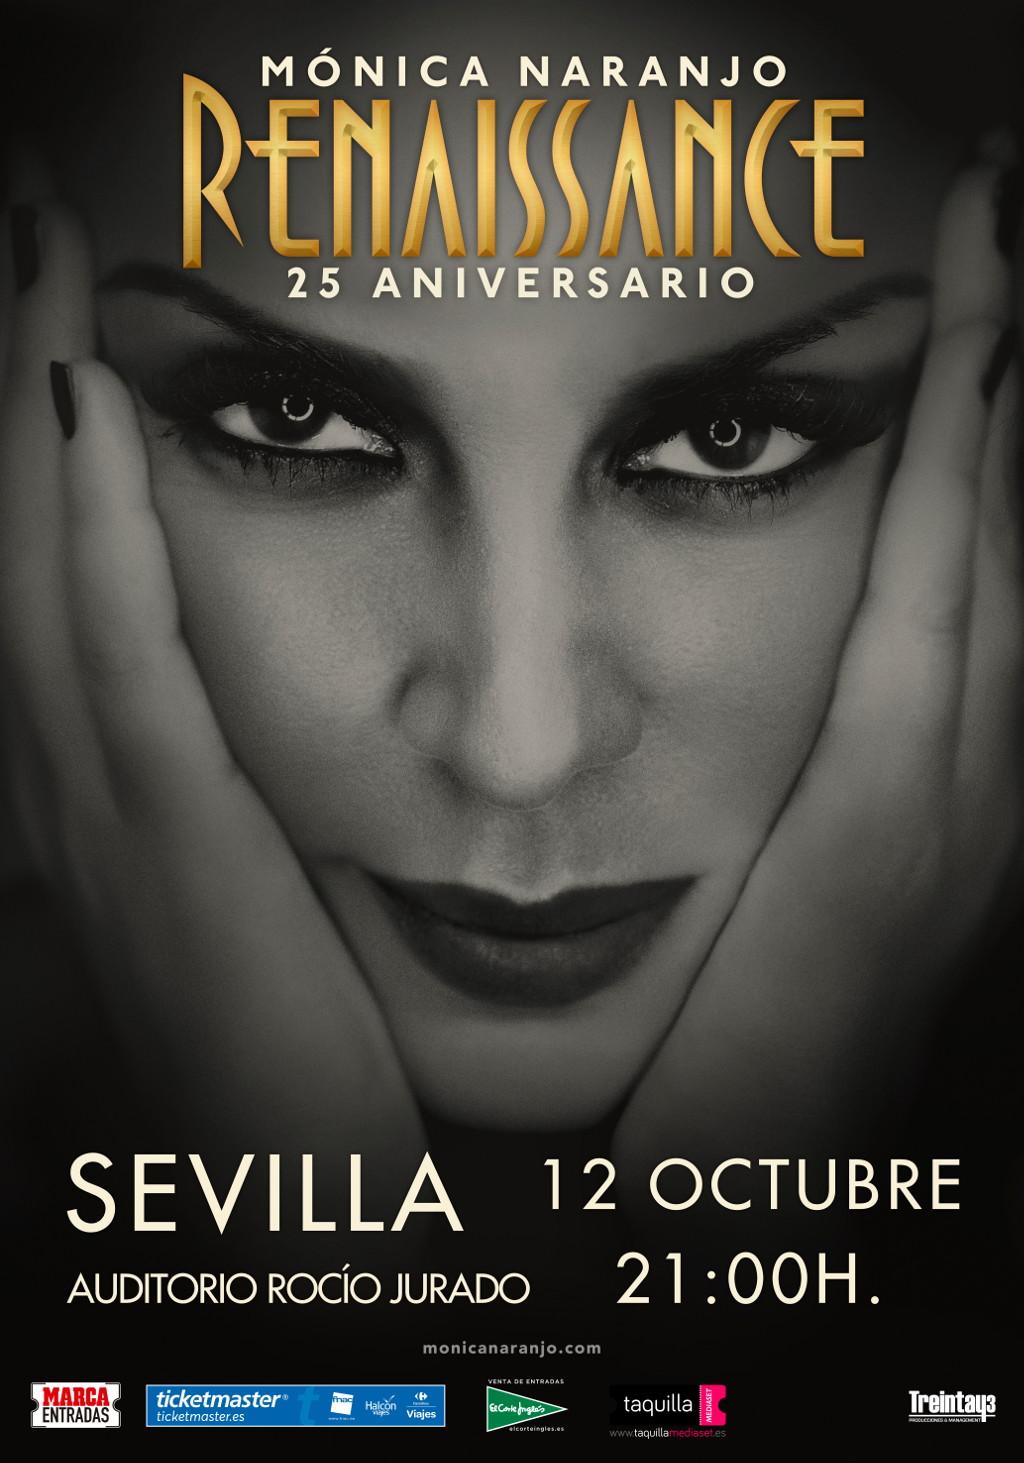 Mónica Naranjo presenta Renaissance en el Auditorio Rocío Jurado de Sevilla